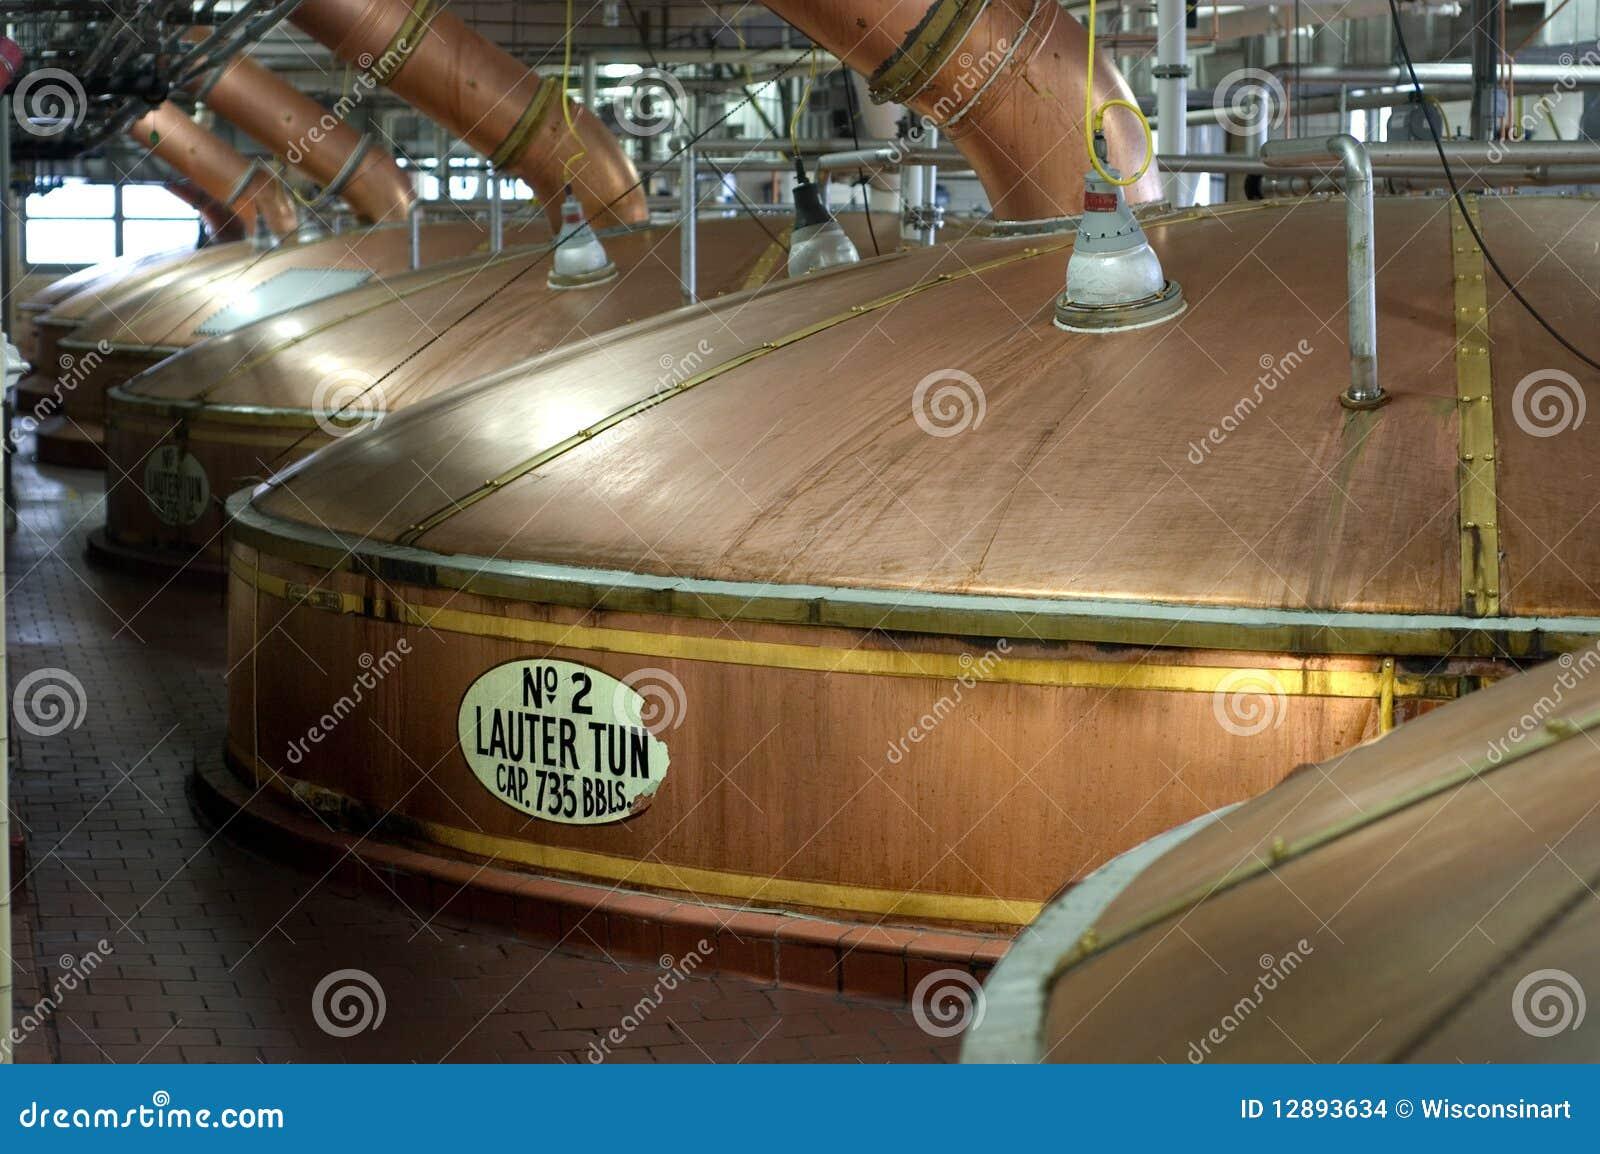 Brewery Beer Lauter Tun Kettles, Miller Beer